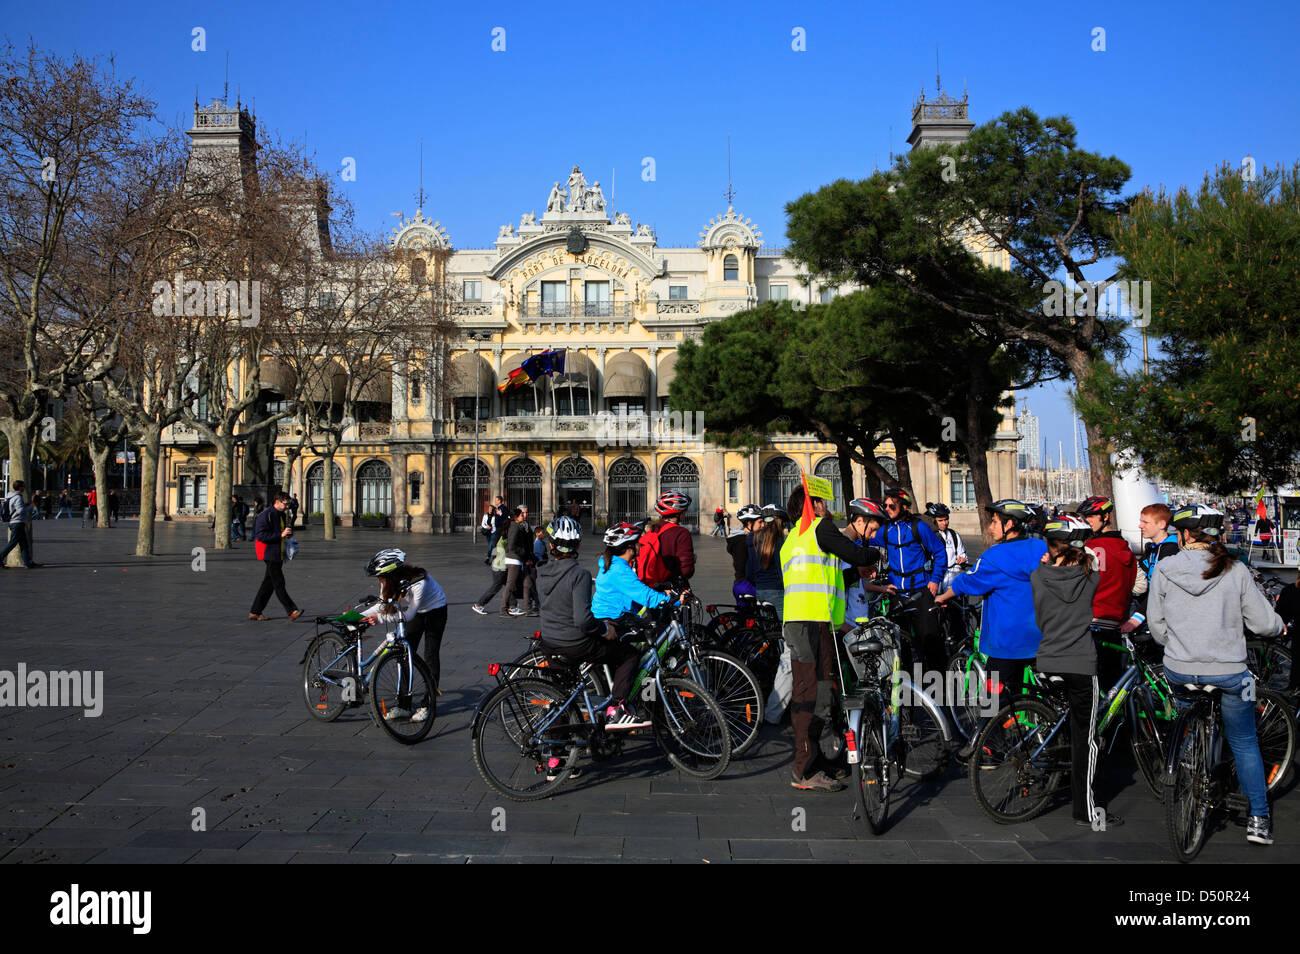 Guided bicycle tour at Placa del Portal de la Pau at harbor, Barcelona, Spain Stock Photo